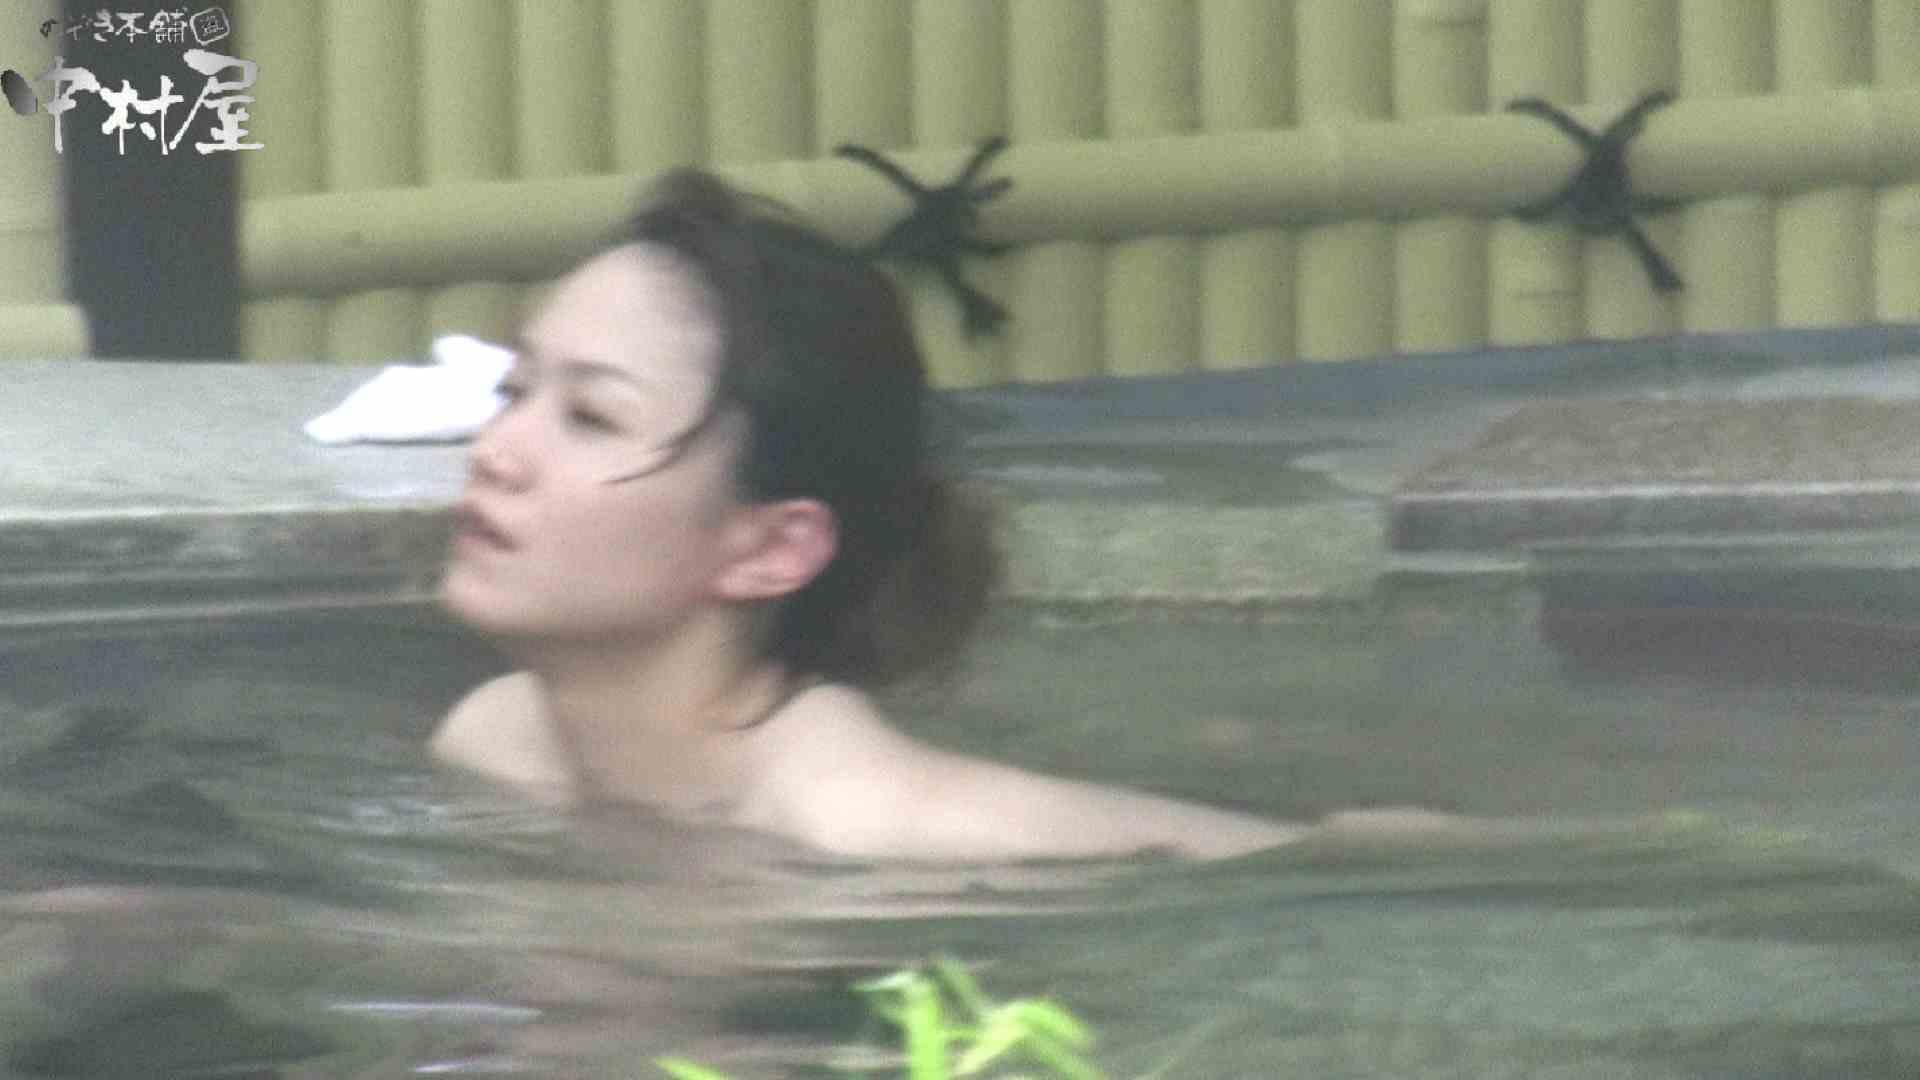 Aquaな露天風呂Vol.901 露天風呂編  110PIX 14